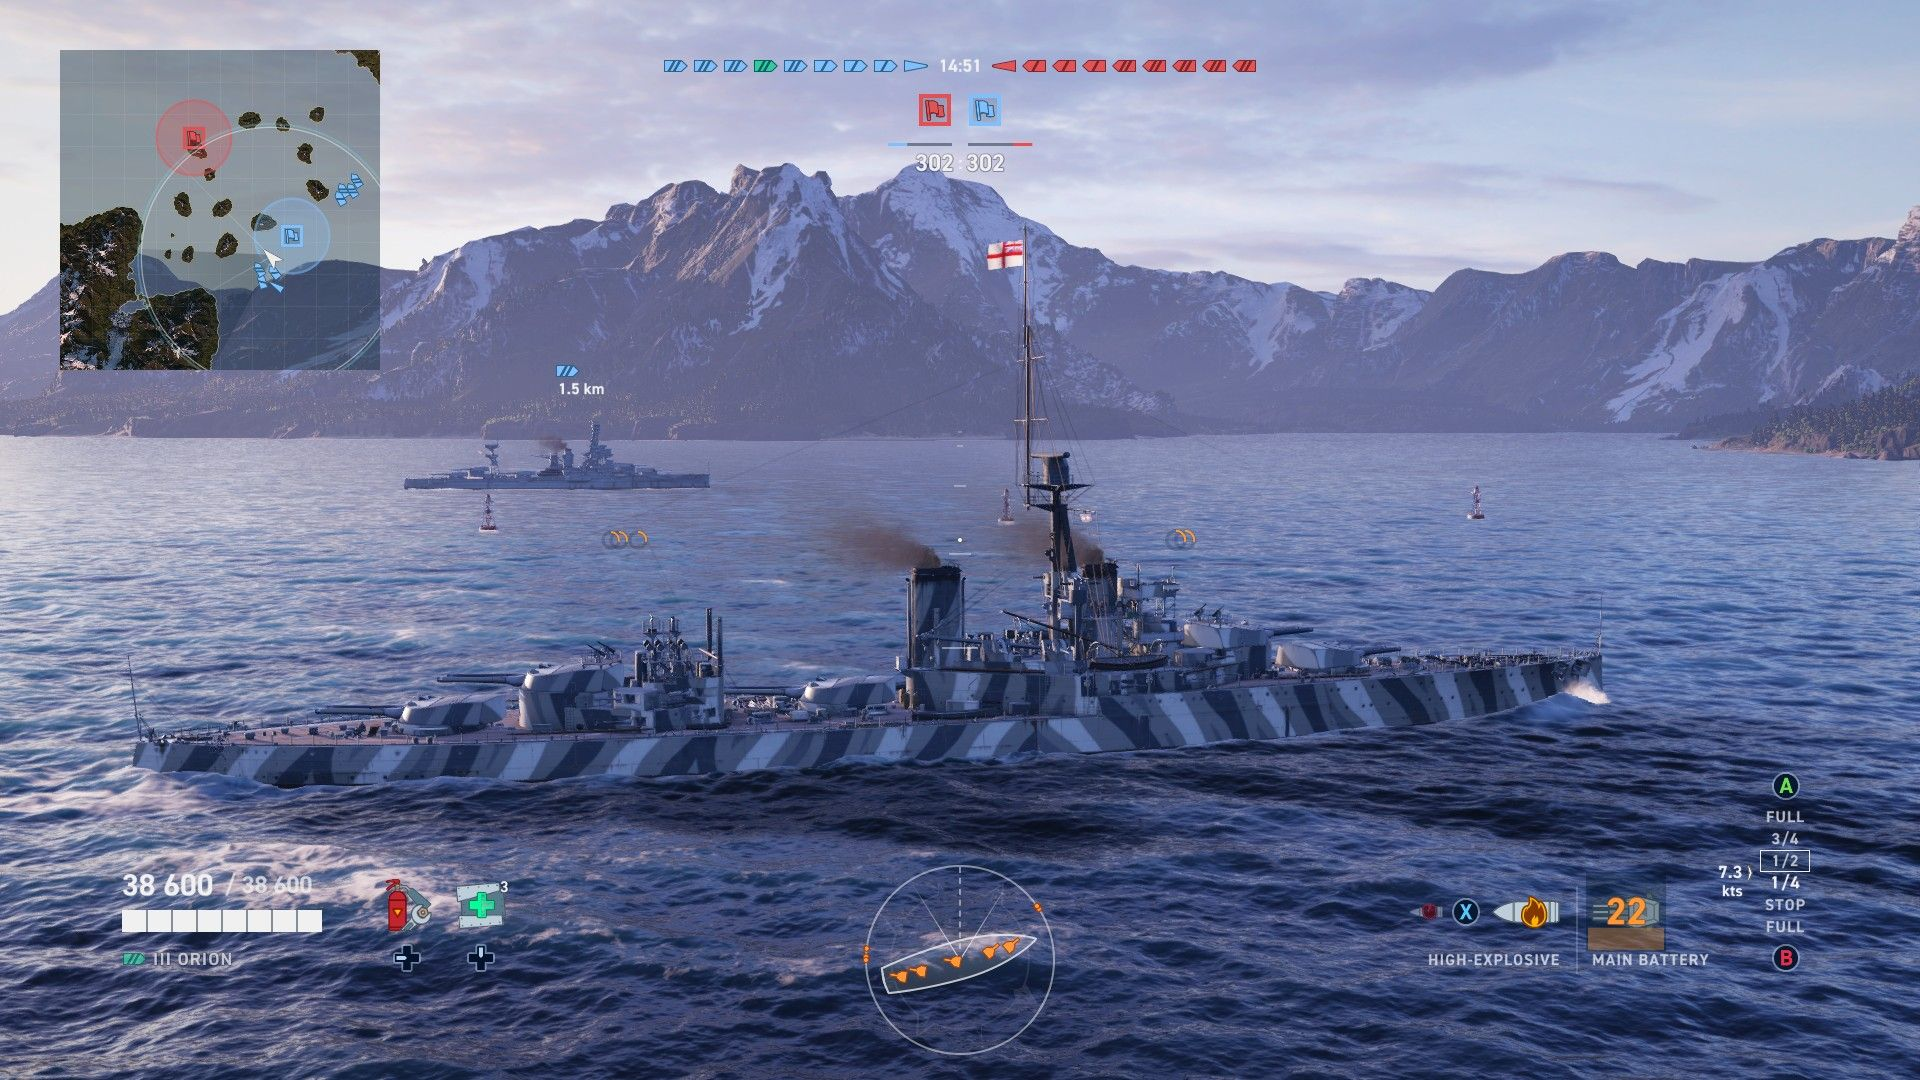 World of Warships Legends - Xbox One - EINRIB13 - UK tier 3